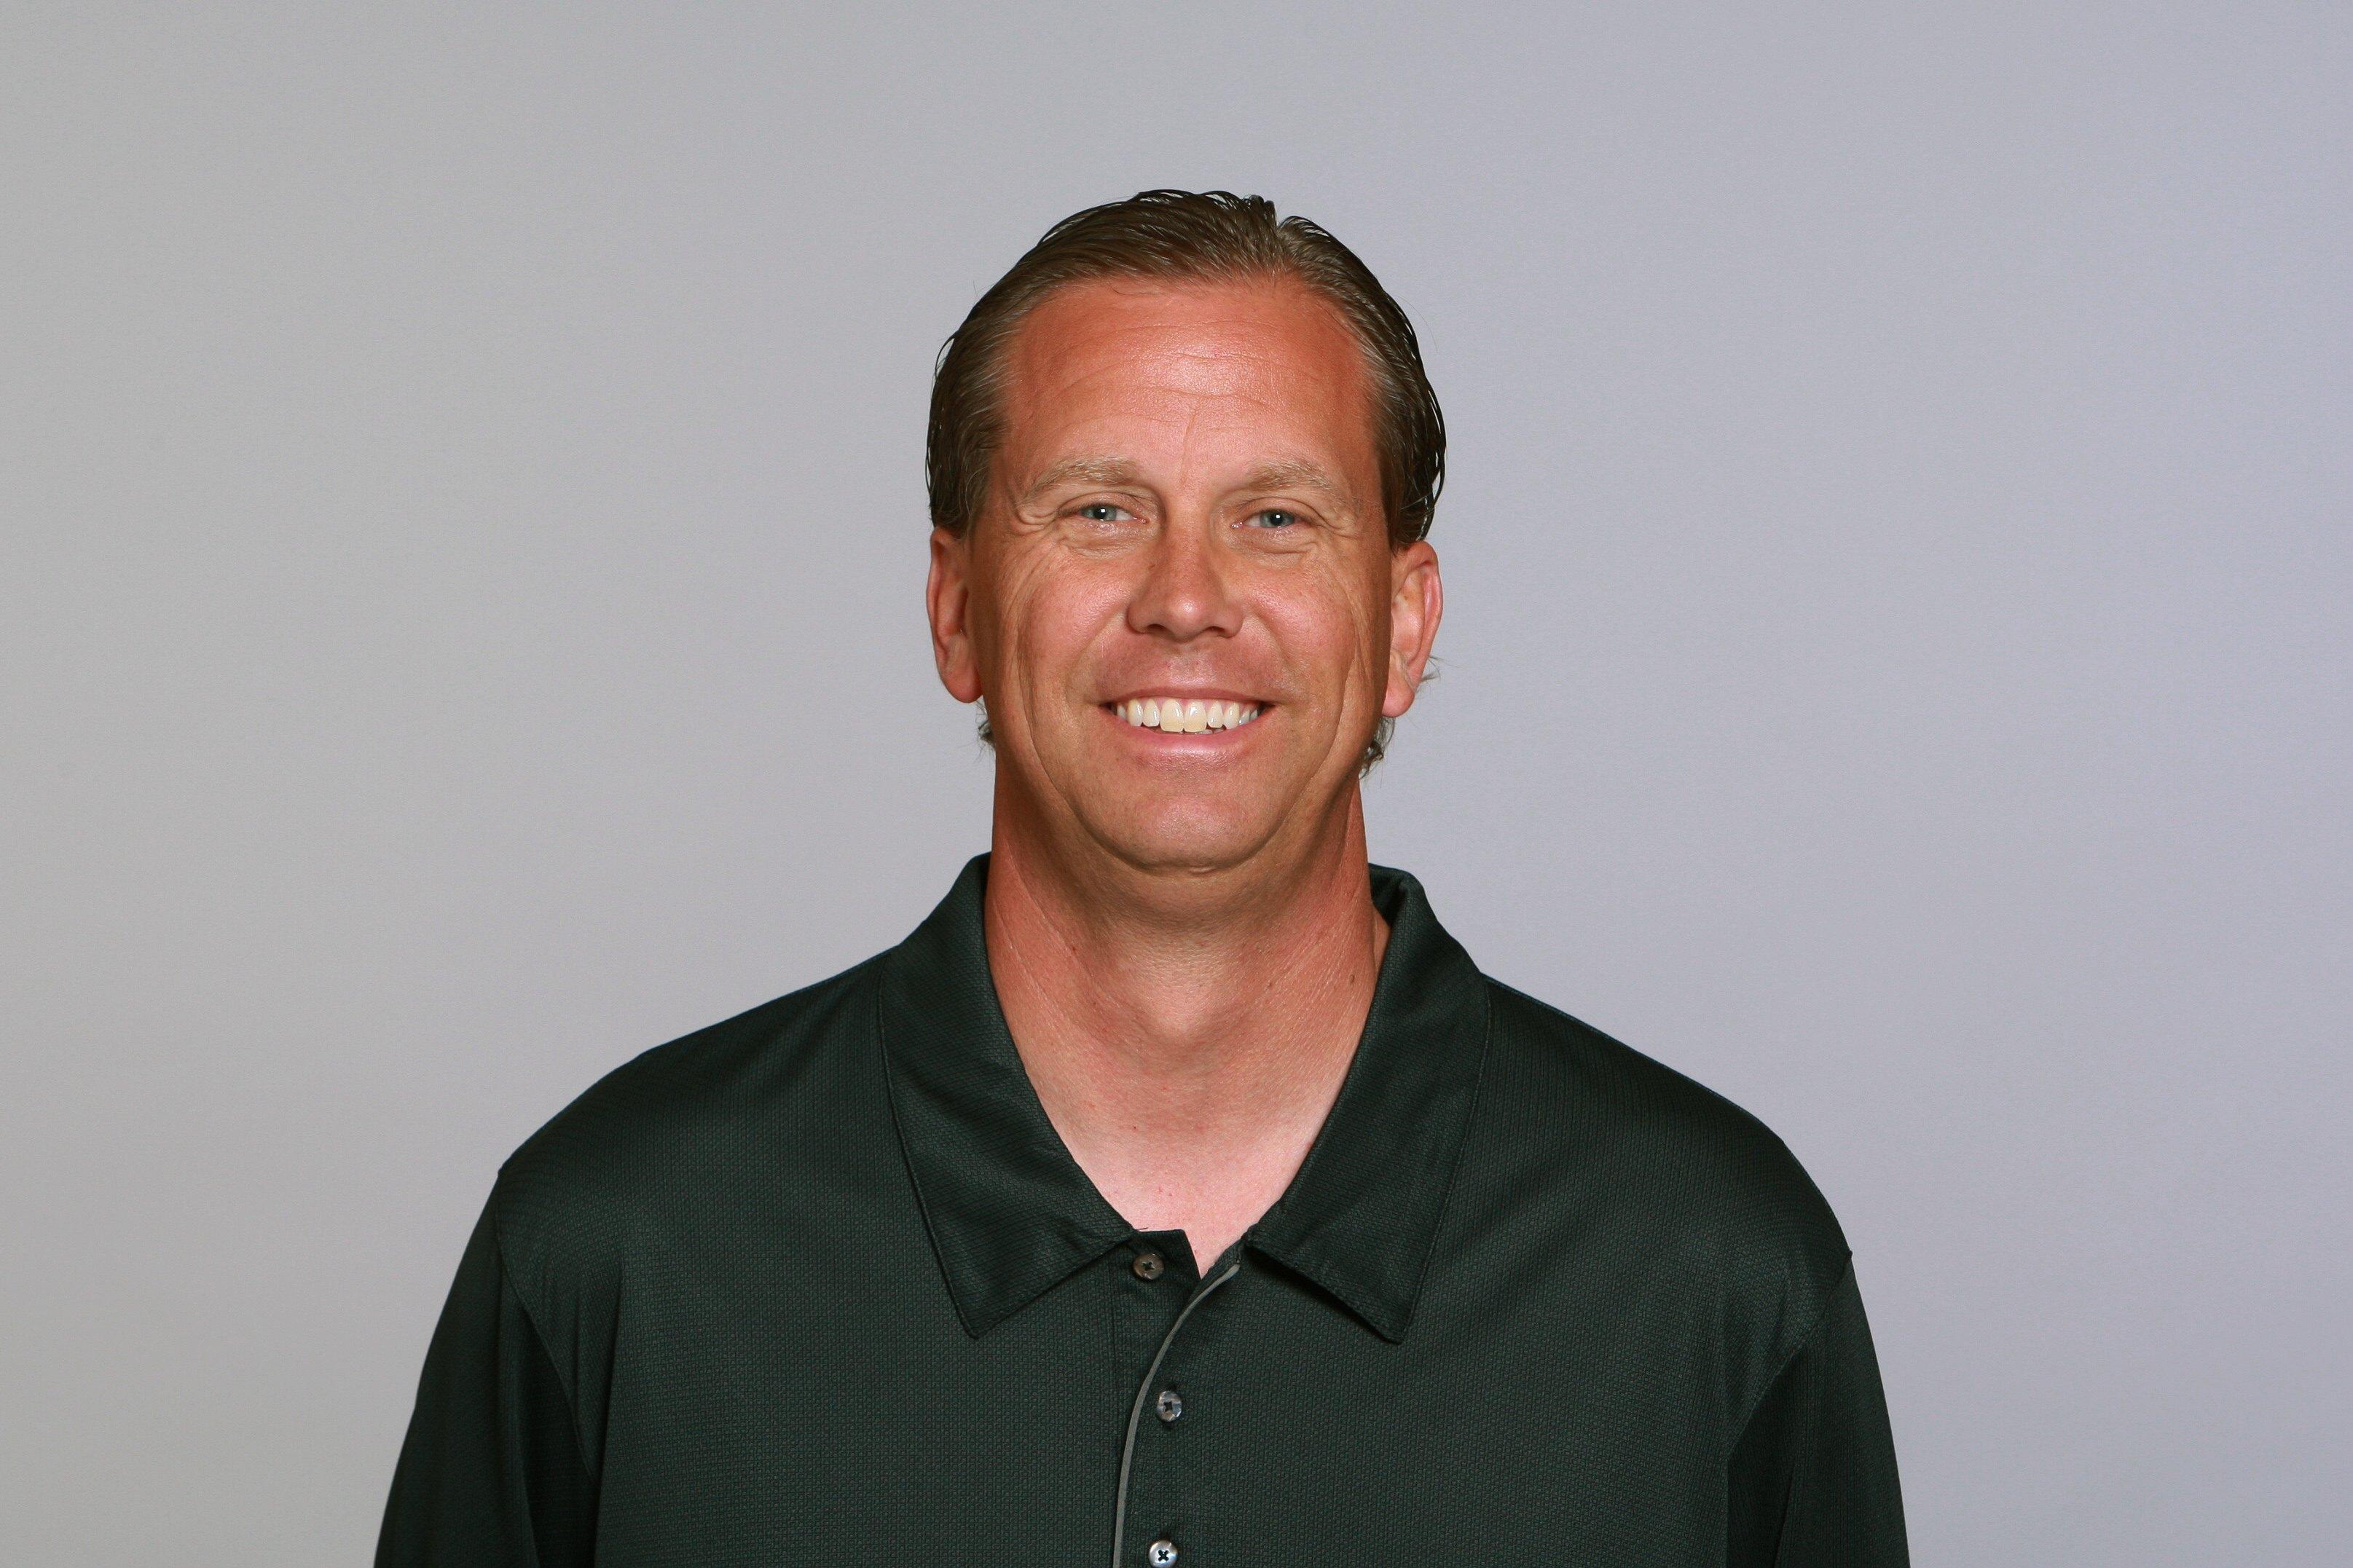 JACKSONVILLE, FL - 2009:  Todd Monken of the Jacksonville Jaguars poses for his 2009 NFL headshot at photo day in Jacksonville, Florida.  (Photo by NFL Photos)